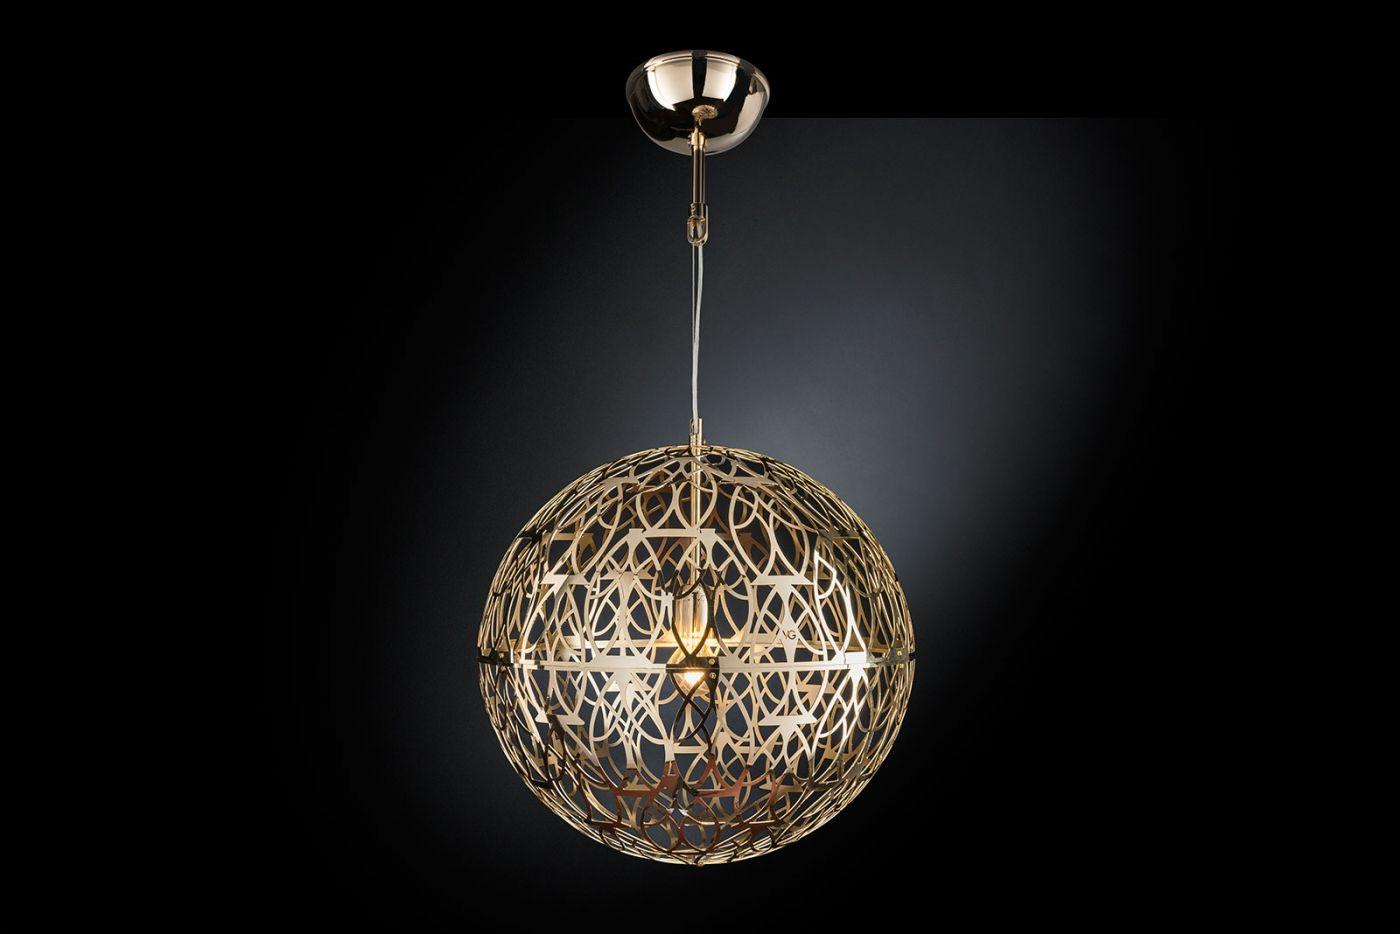 Vgnewtrend Italian Pendant Lamp Arabesque Marte 50 Design Made